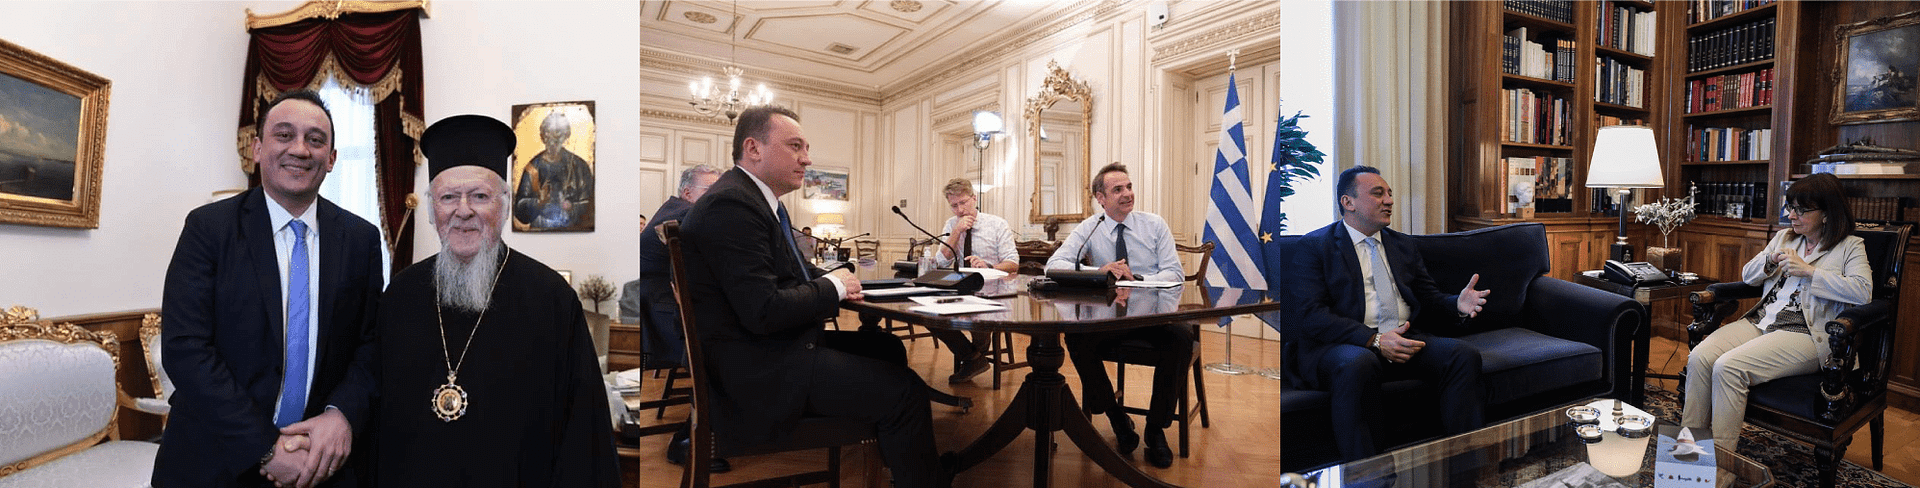 kostas vlasis carouses lpuzzle 1 new | Κώστας Βλάσης | Βουλευτής Αρκαδίας Νέα Δημοκρατία